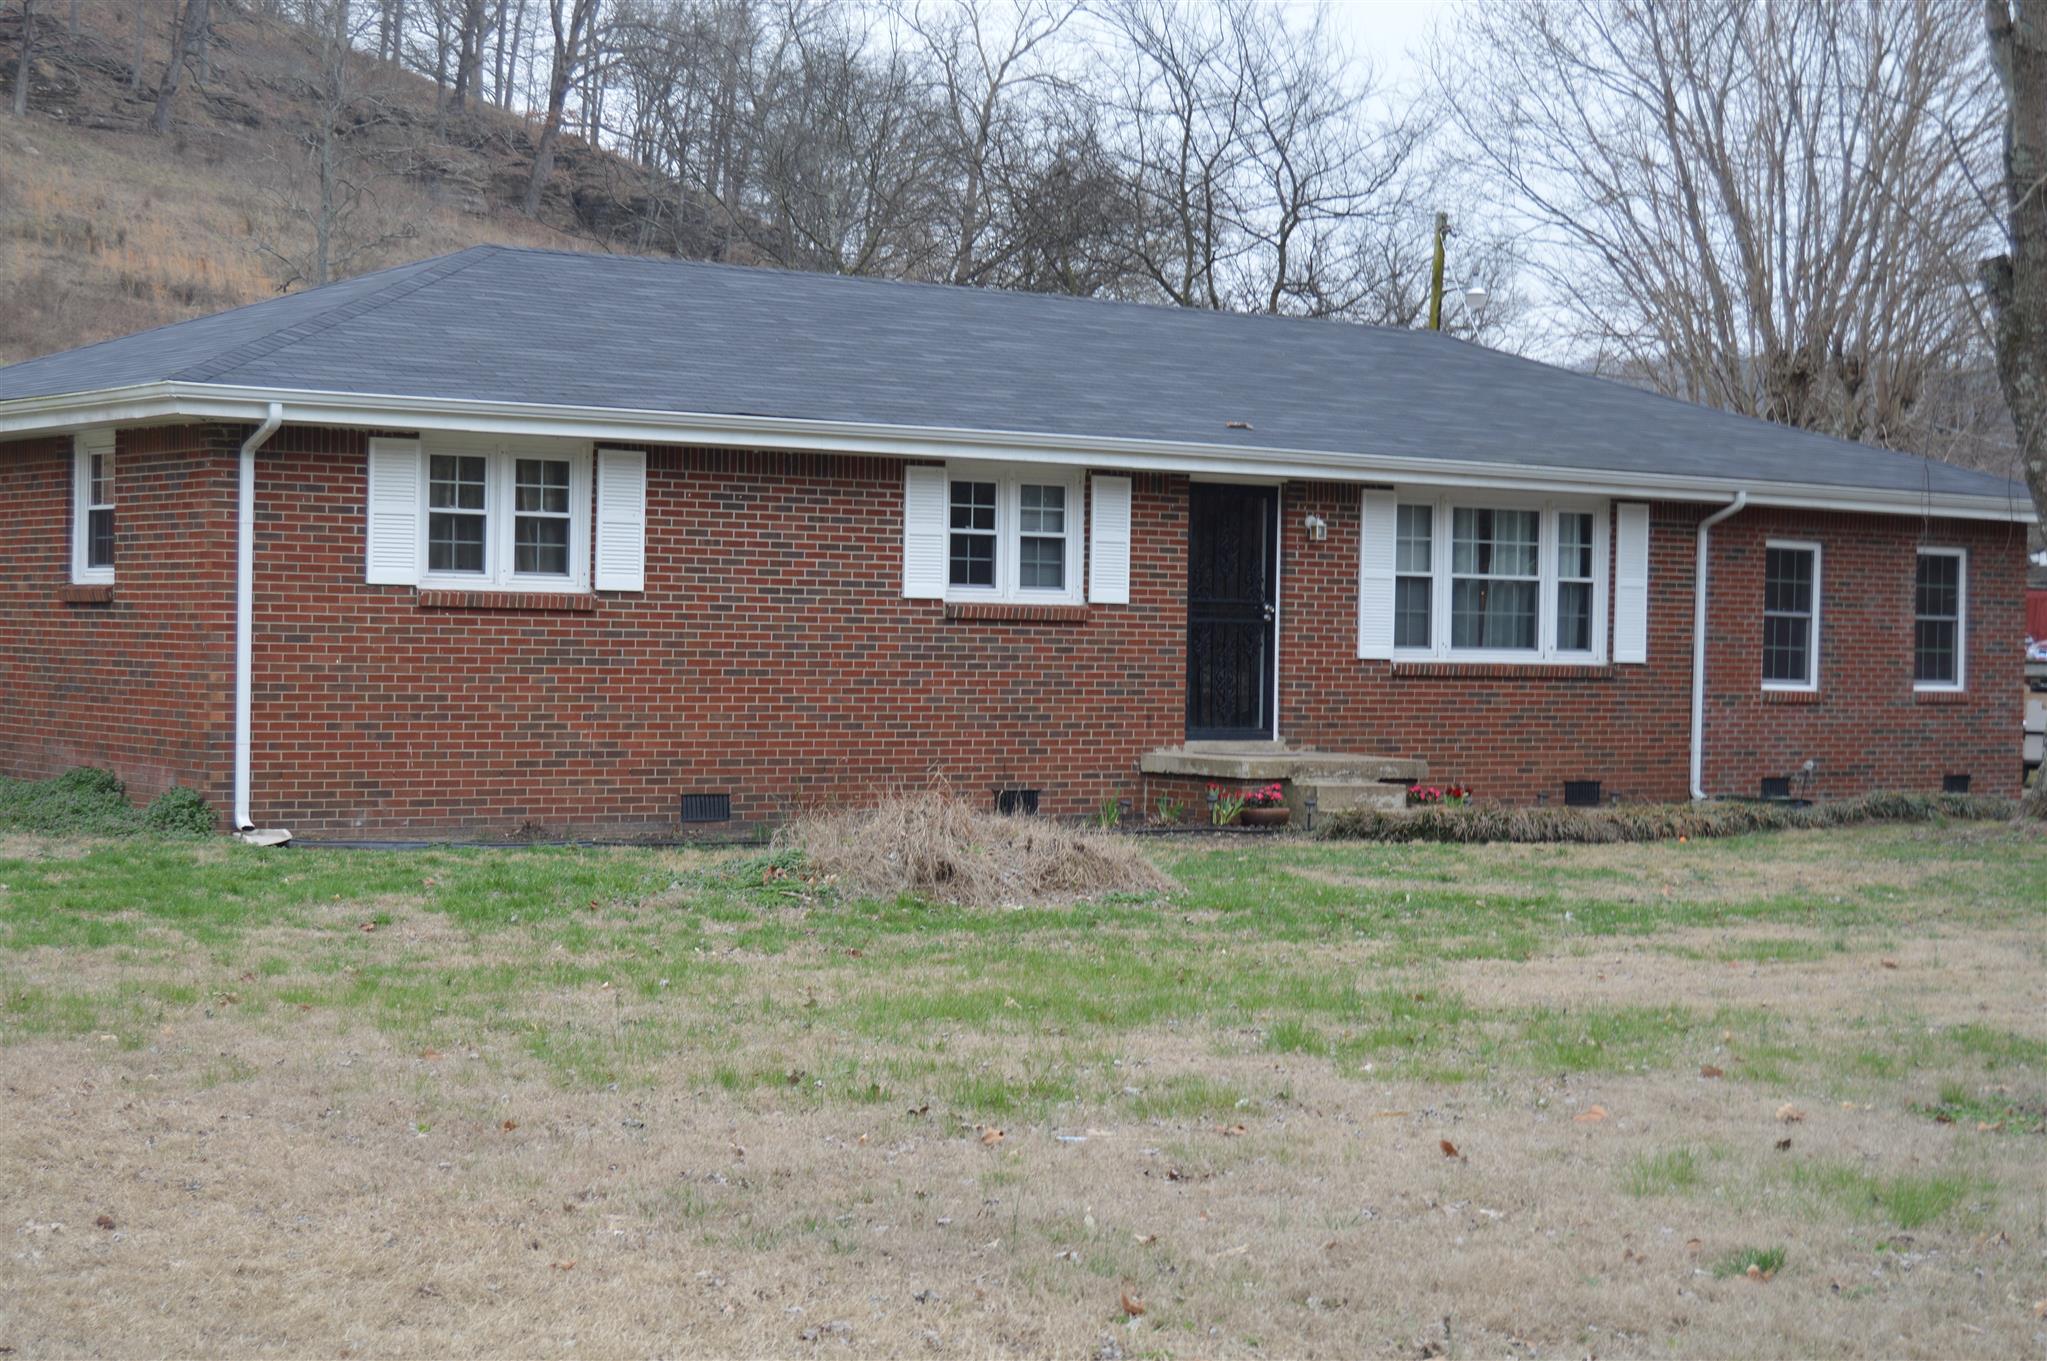 Photo of 1120 Slaters Creek Rd  Goodlettsville  TN